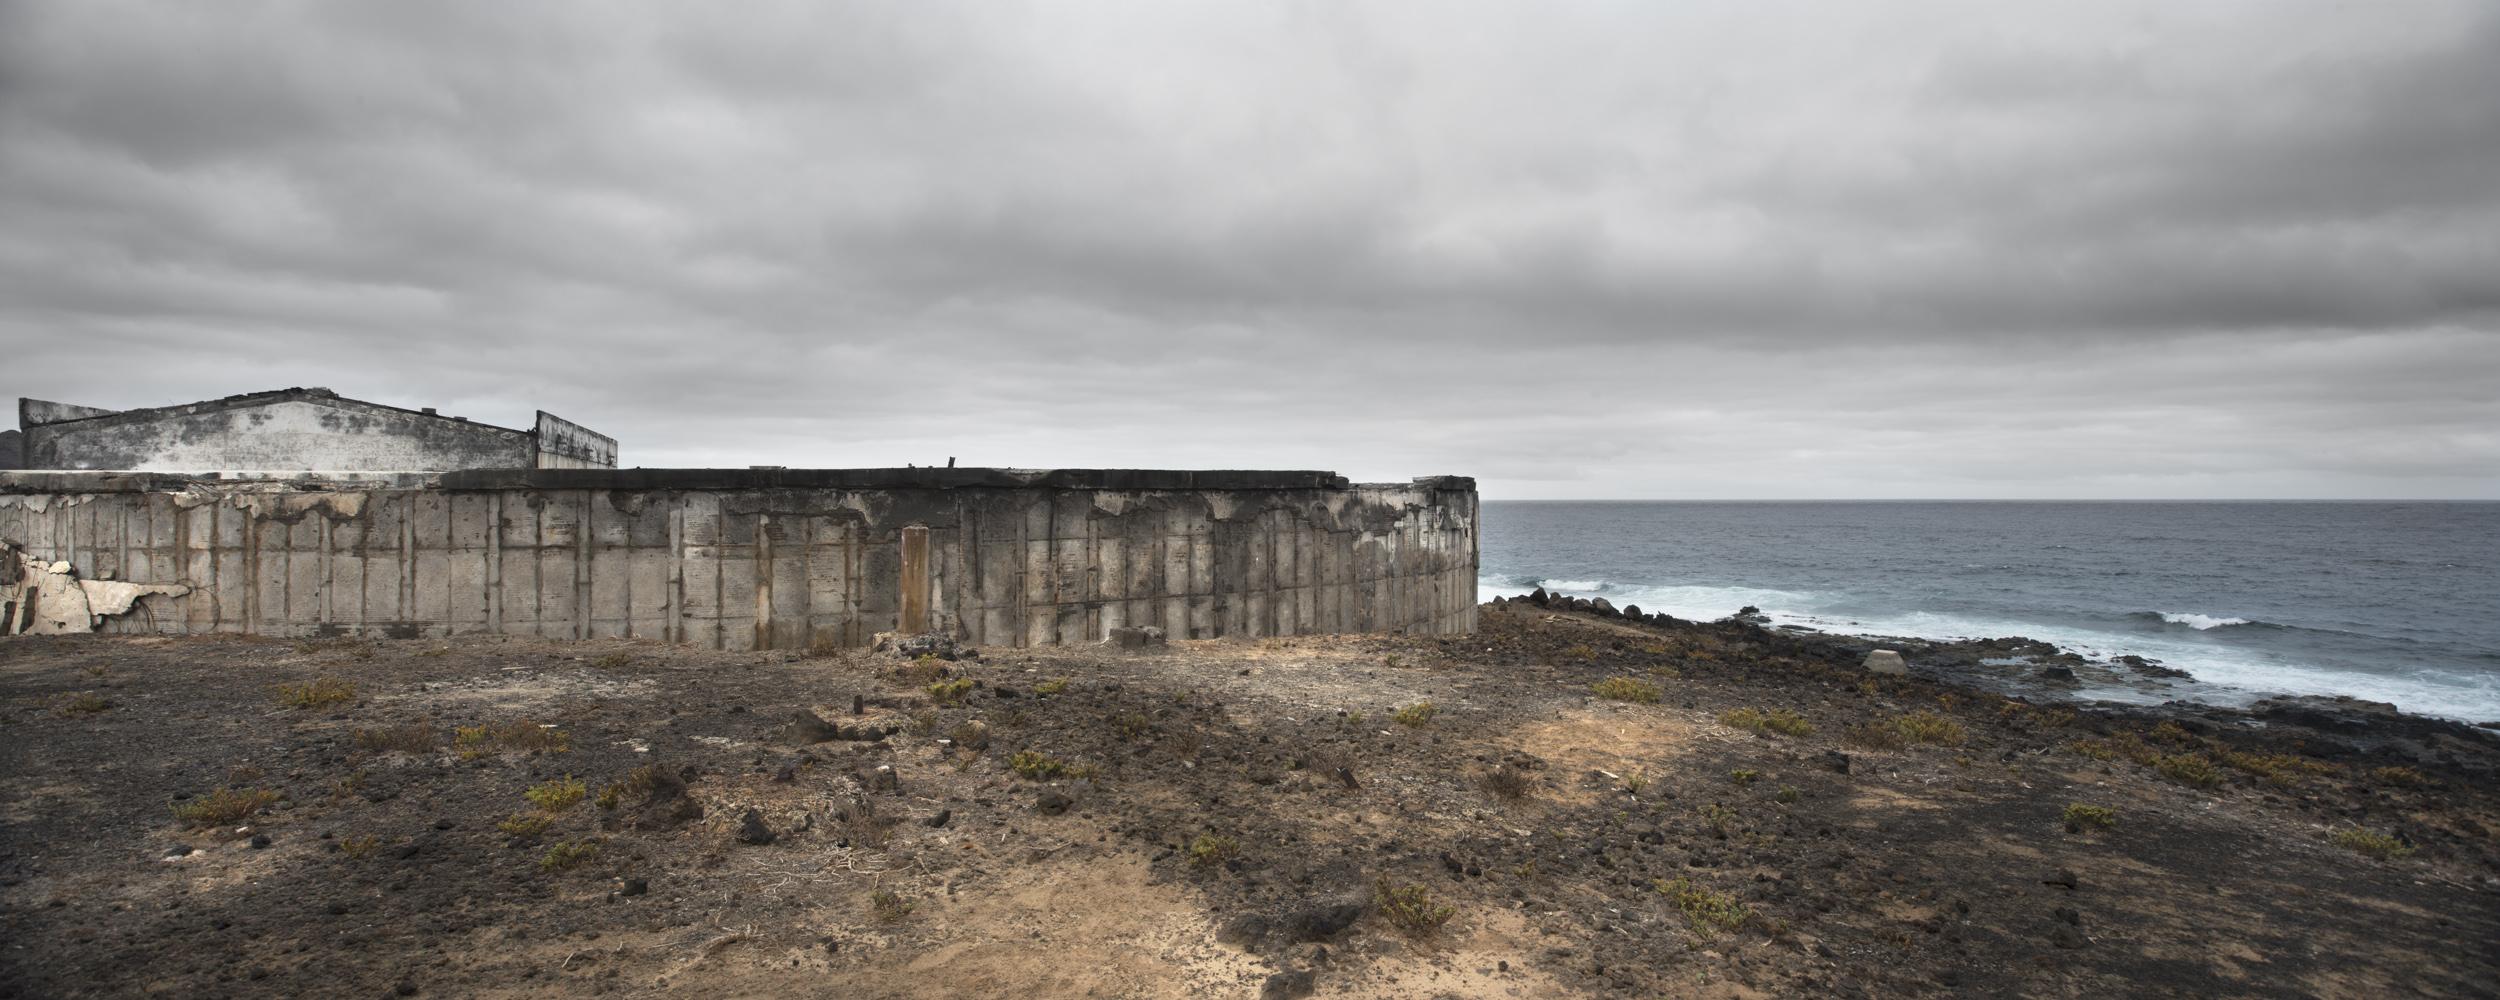 windy - THE ISLAND OF THE HORIZON - cesar azcarate, fotografia